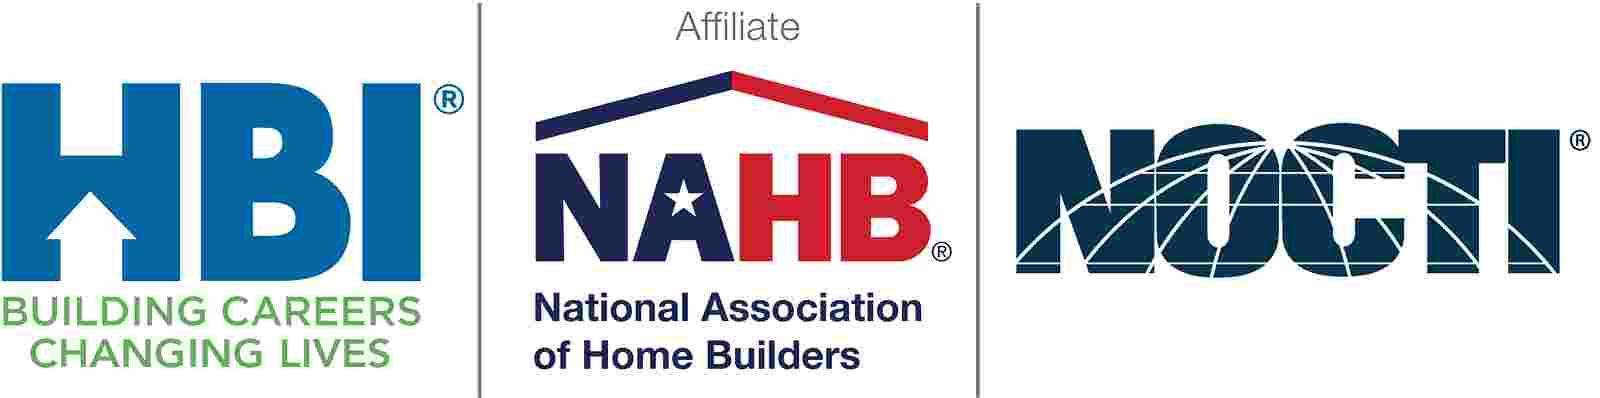 HBI, NAHB, NOCTI logos